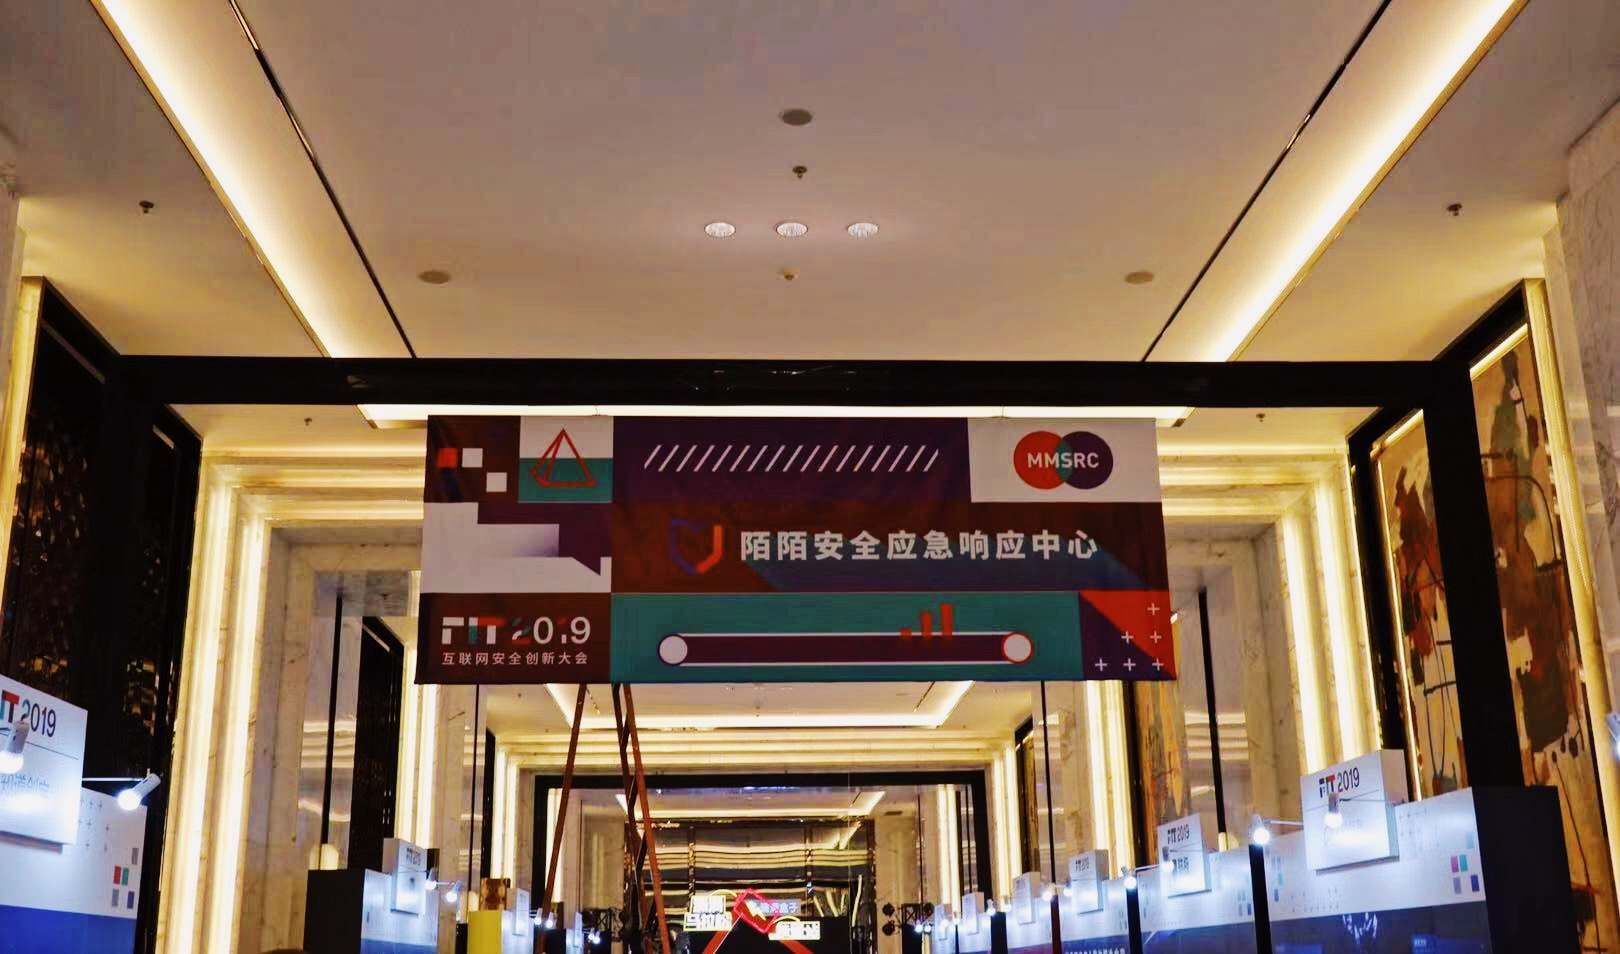 https://momo-mmsrc.oss-cn-hangzhou.aliyuncs.com/img-b957a262-5c97-3812-9f59-373601f27d94.jpeg